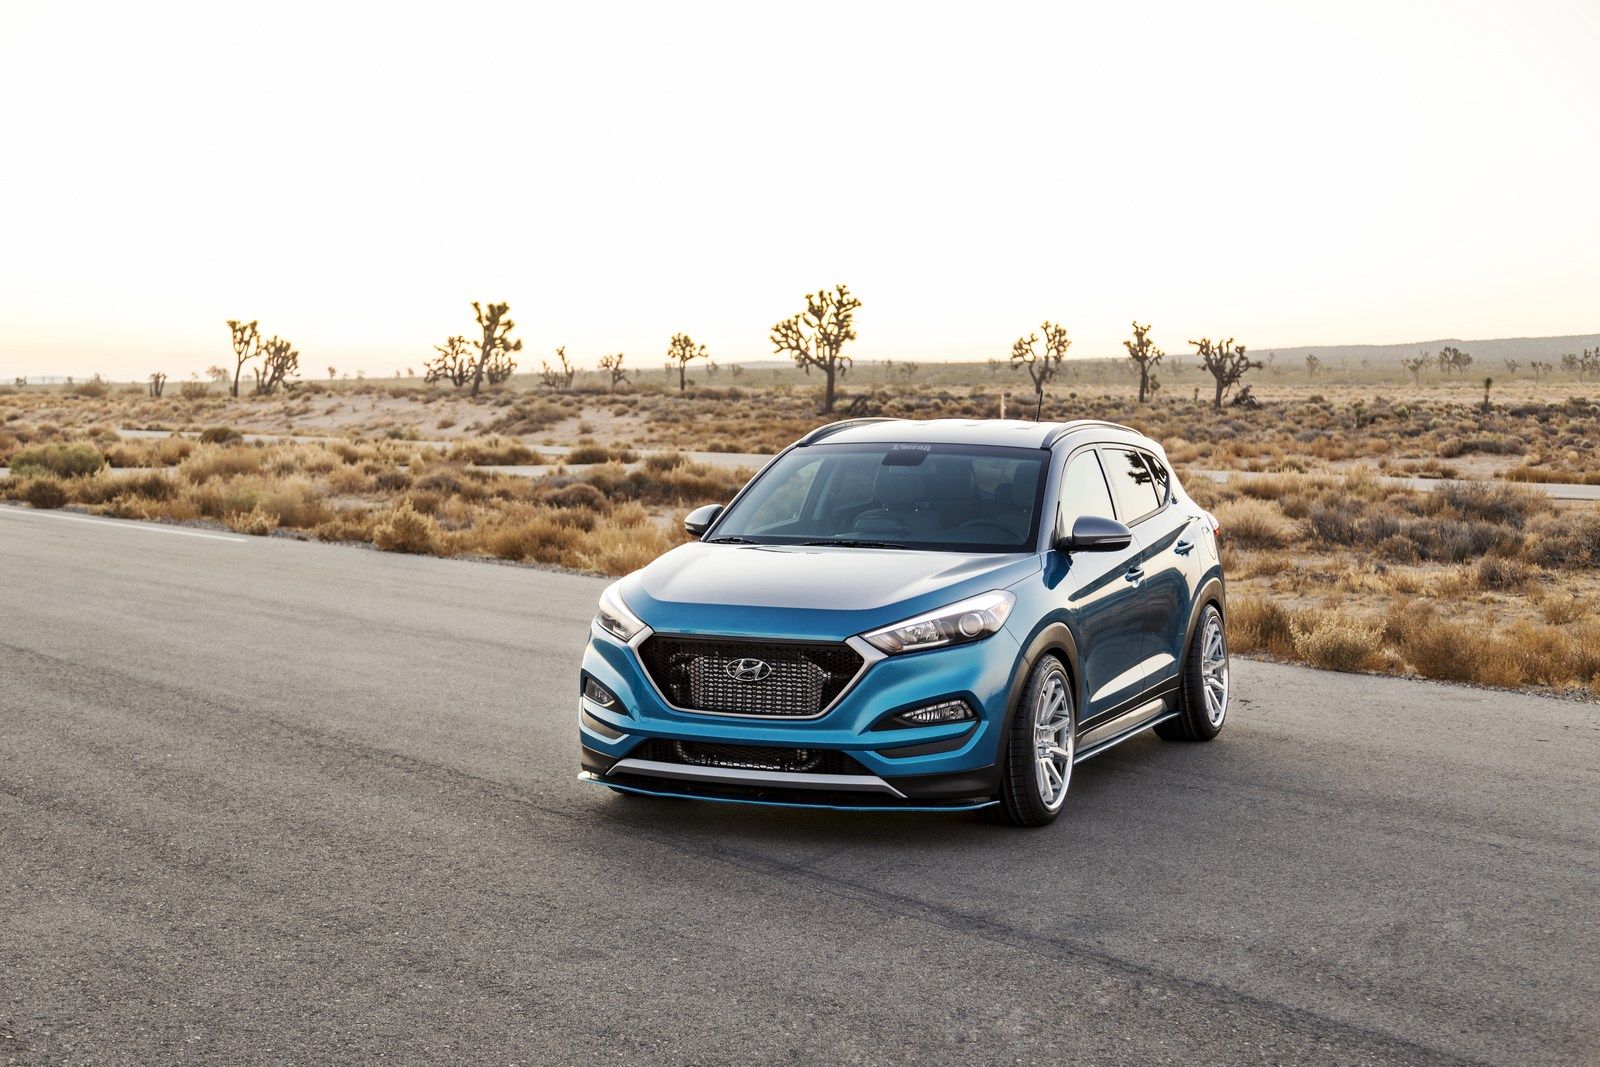 Hyundai-Vaccar-Tucson-Sport-Concept-3